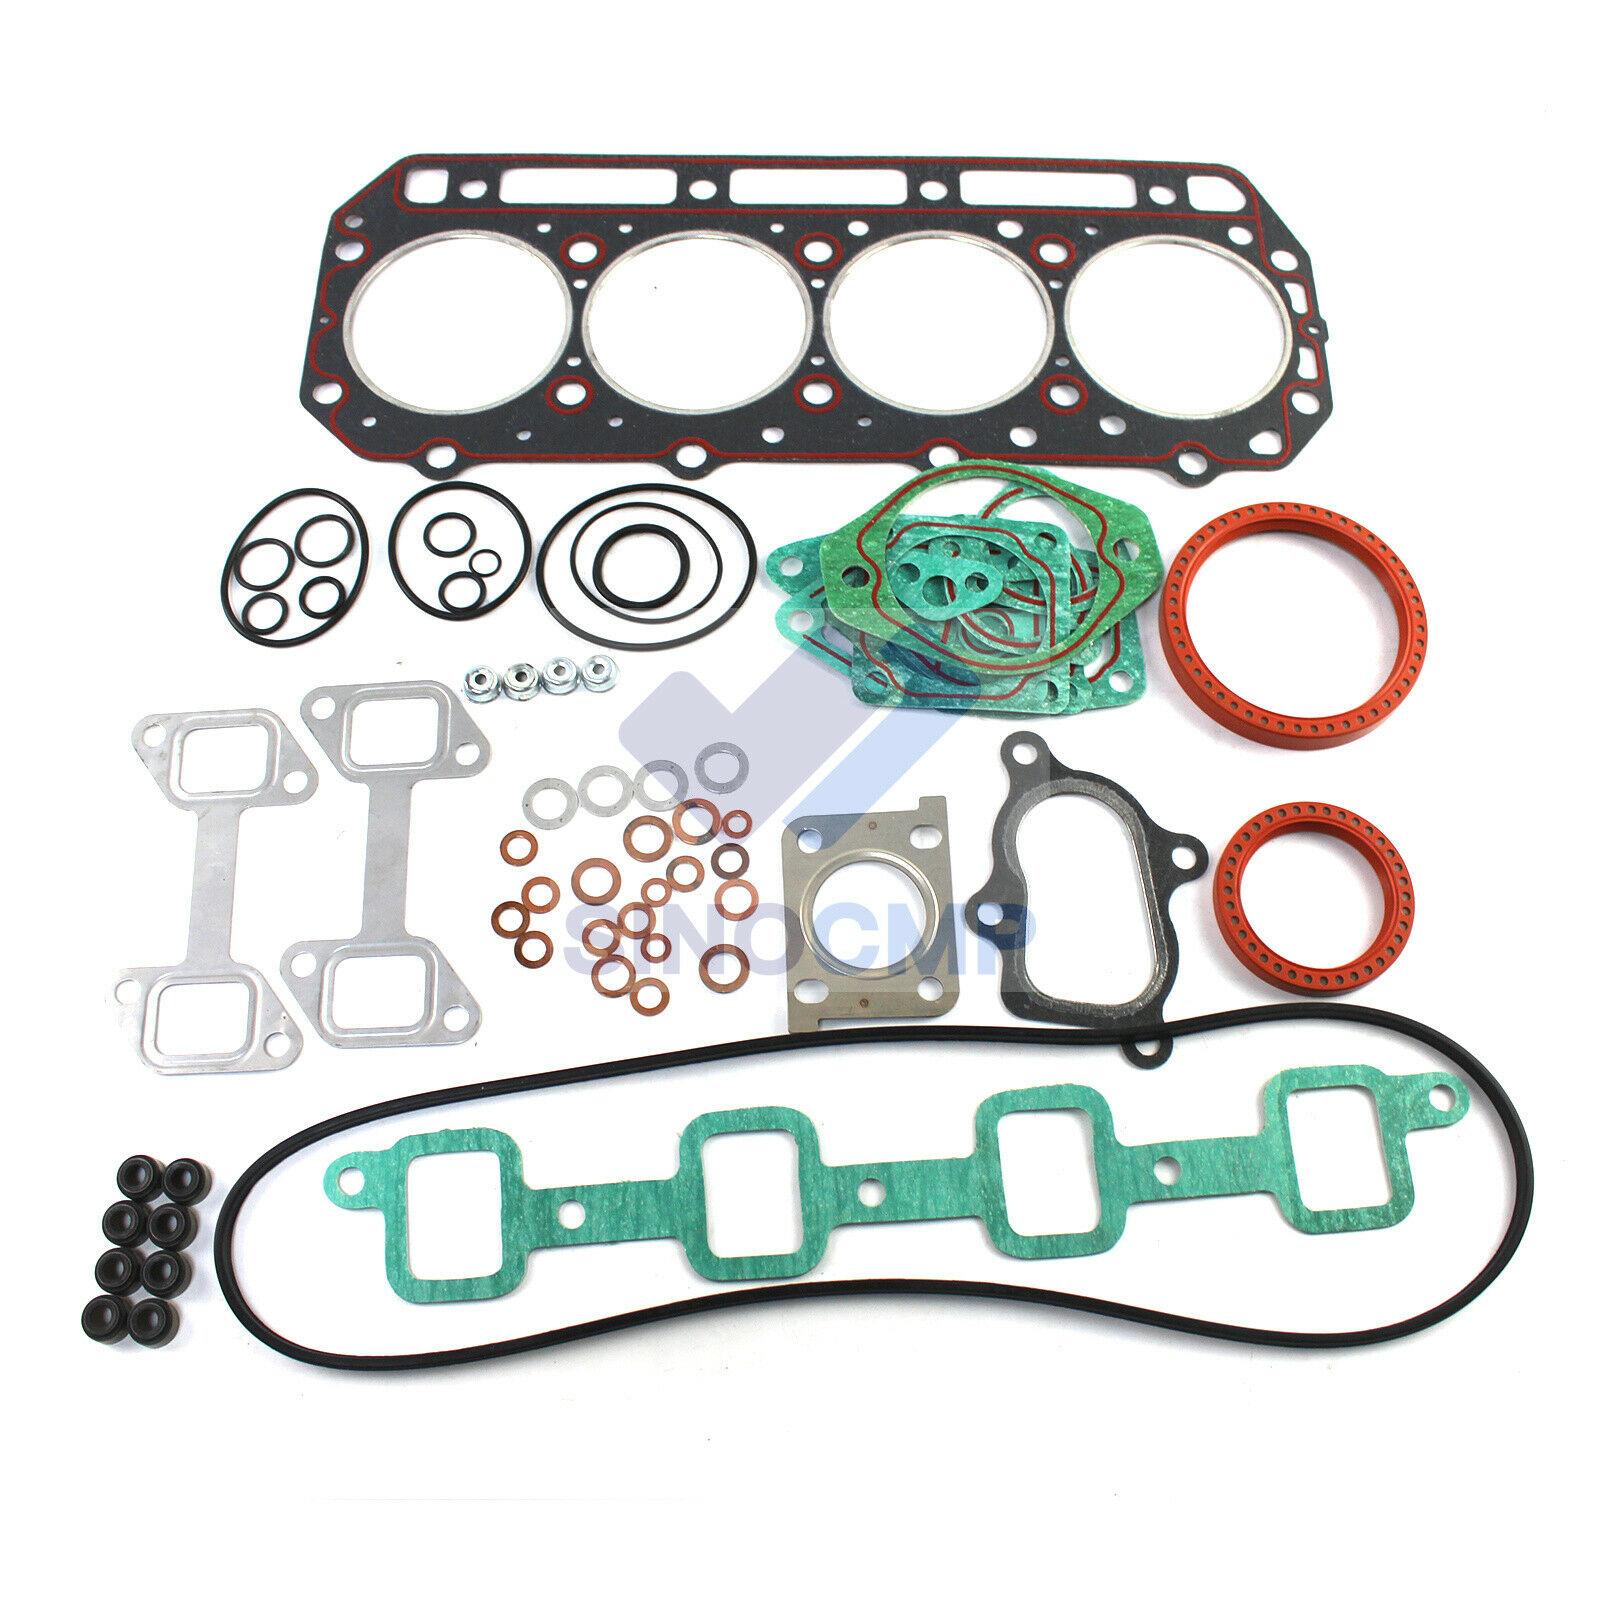 Kit de juntas de reparación de motor 4D32 4D32T para Mitsubishi CAT E40B E70B E311B, piezas de reparación de cabeza de cilindro de excavadora